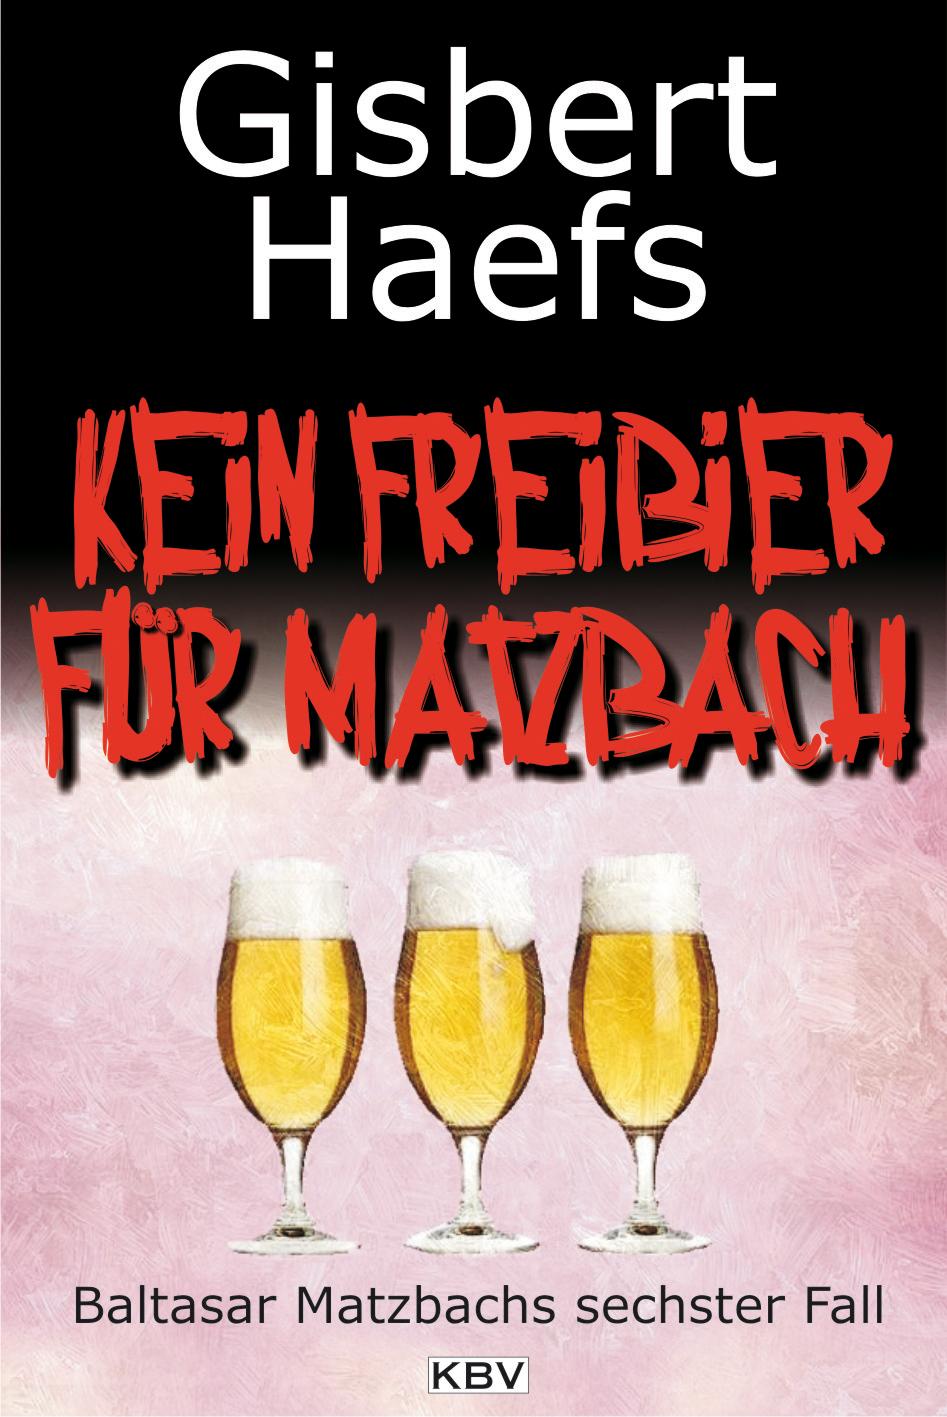 Gisbert Haefs Kein Freibier für Matzbach gisbert brom bullarium trajectense latin edition